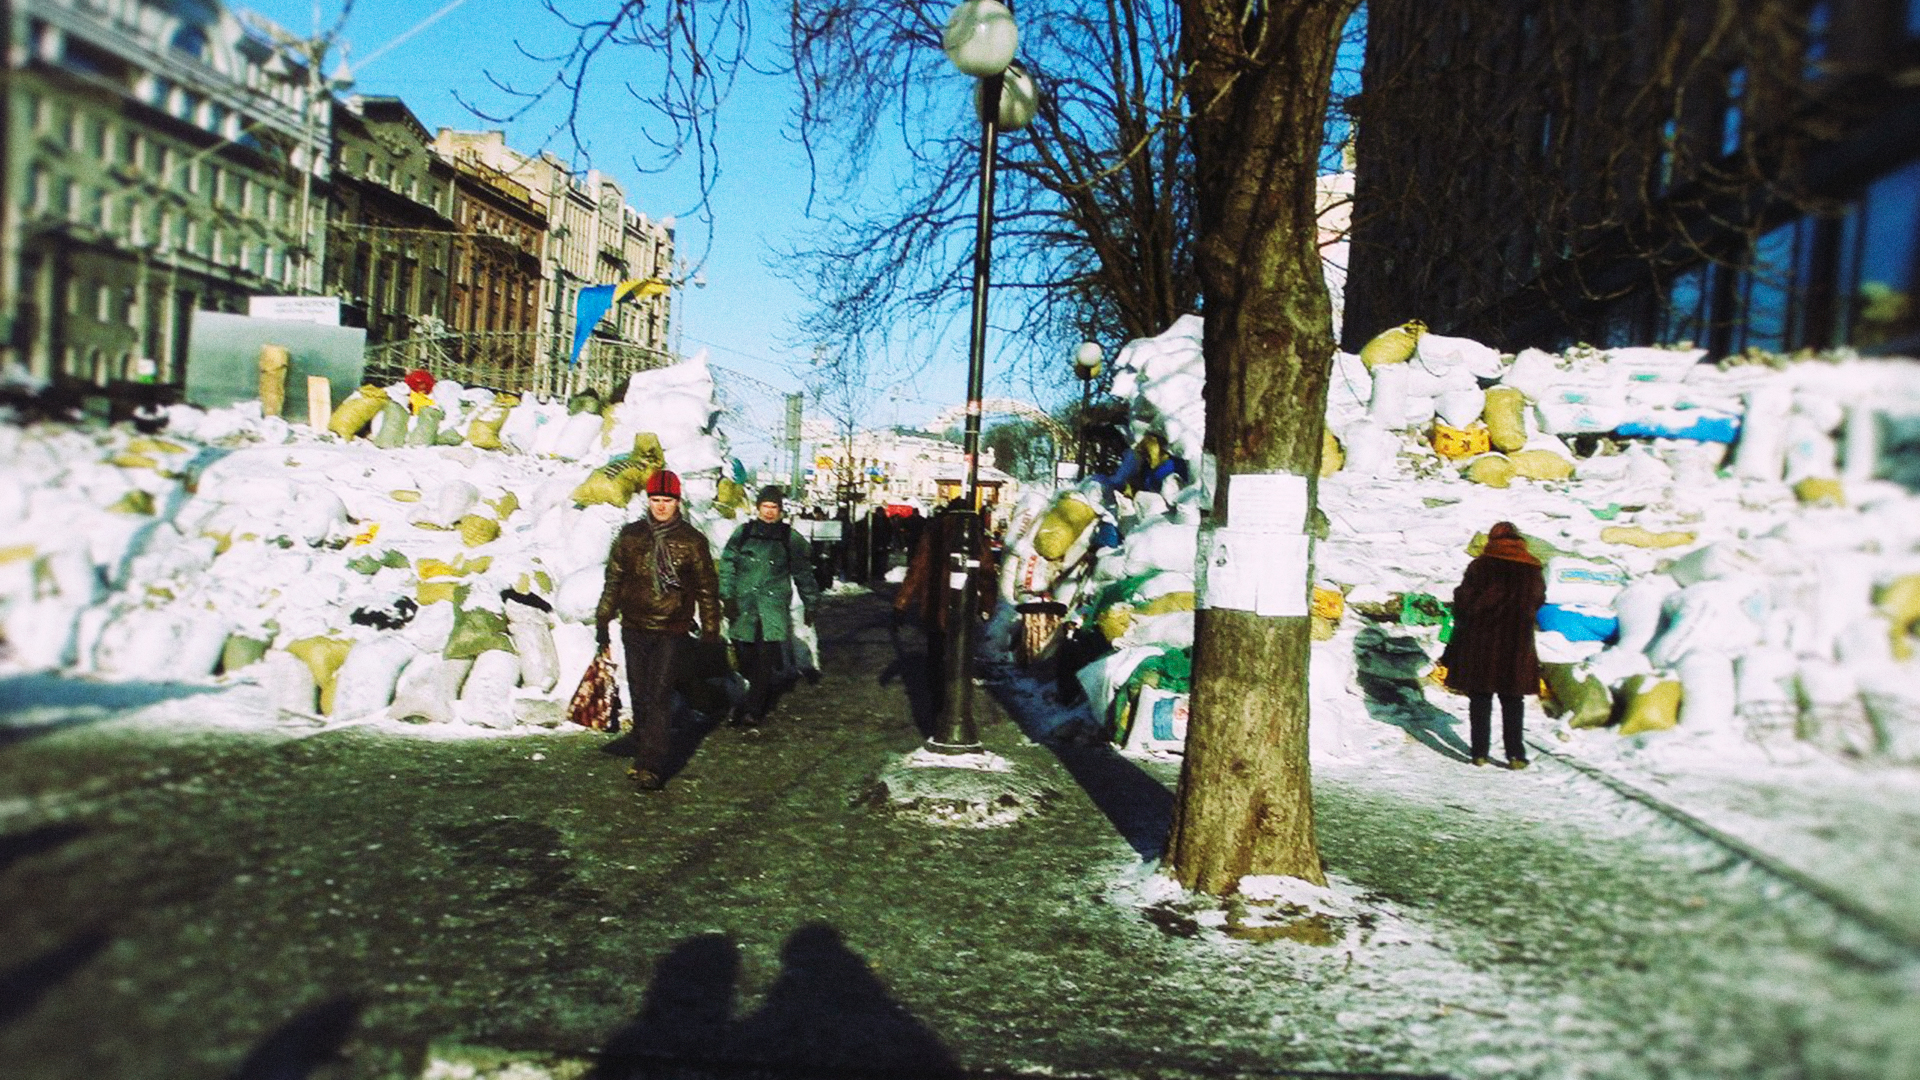 maidan Nezalezhnosti by future24mlt